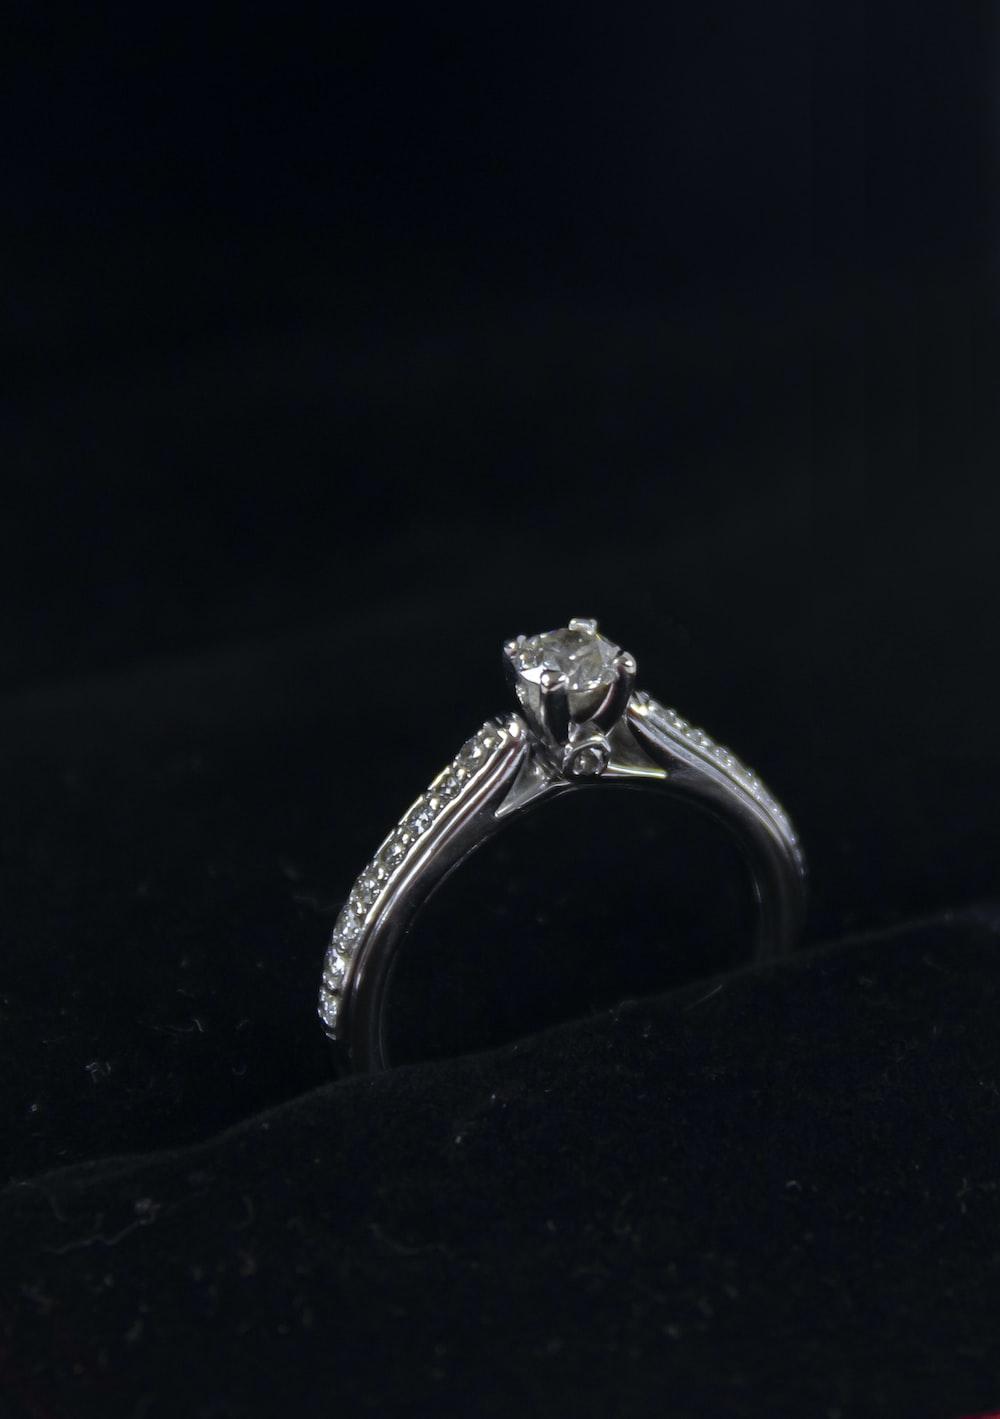 silver diamond ring on black textile